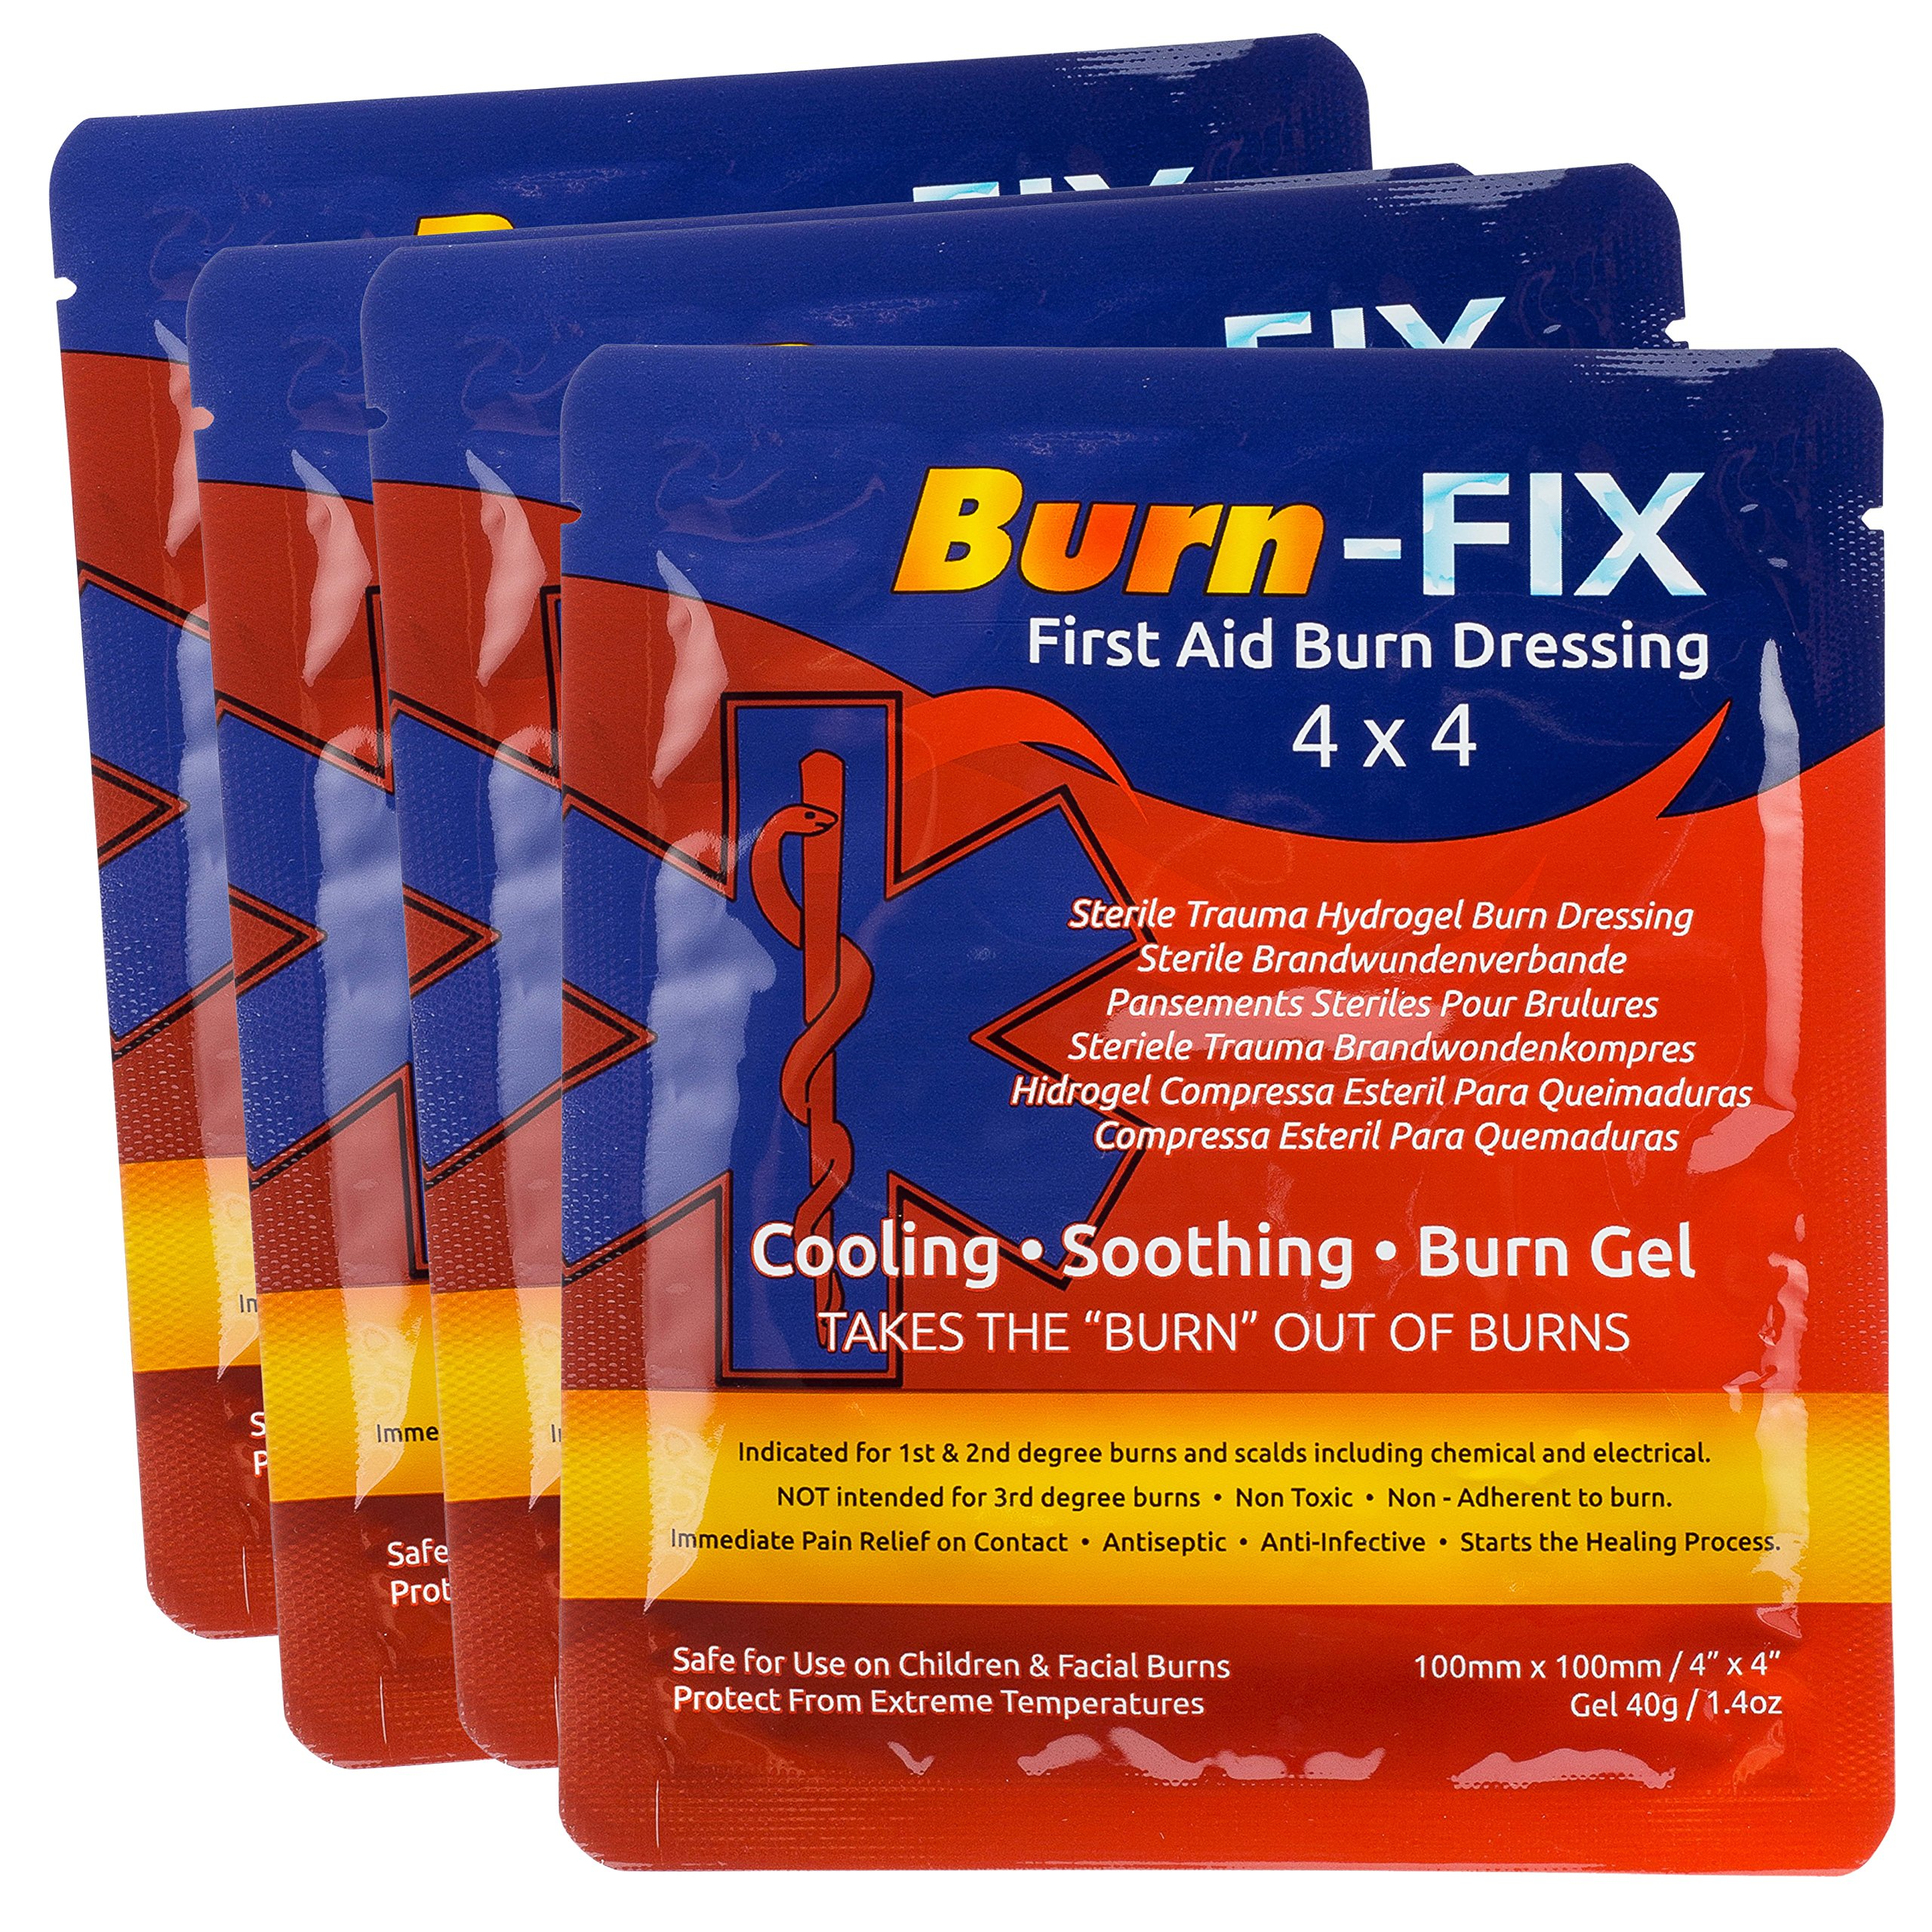 Burn-FIX- 4 Pack-Burn Gel Dressing 4'' X 4'' Burn Care-First Aid Treatment. Immediate Pain Relief Burn Cream- Hydrogel For 1st, 2nd Degree Burns, Chemical, Razor and Sunburns. For Home, Work, Fire, EMS. by Burn-FIX